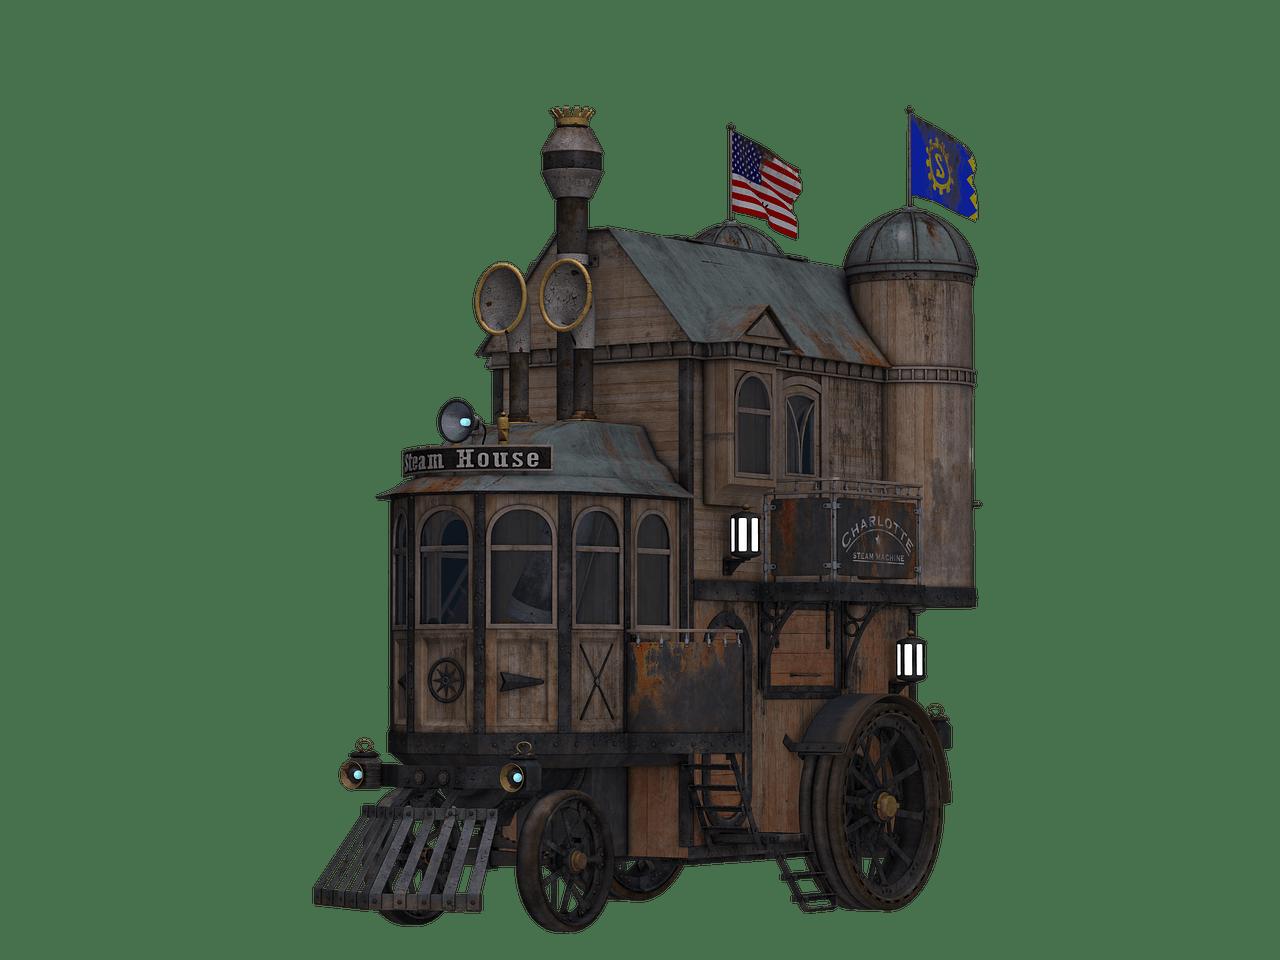 Locomotive side view transparent. Steampunk clipart train